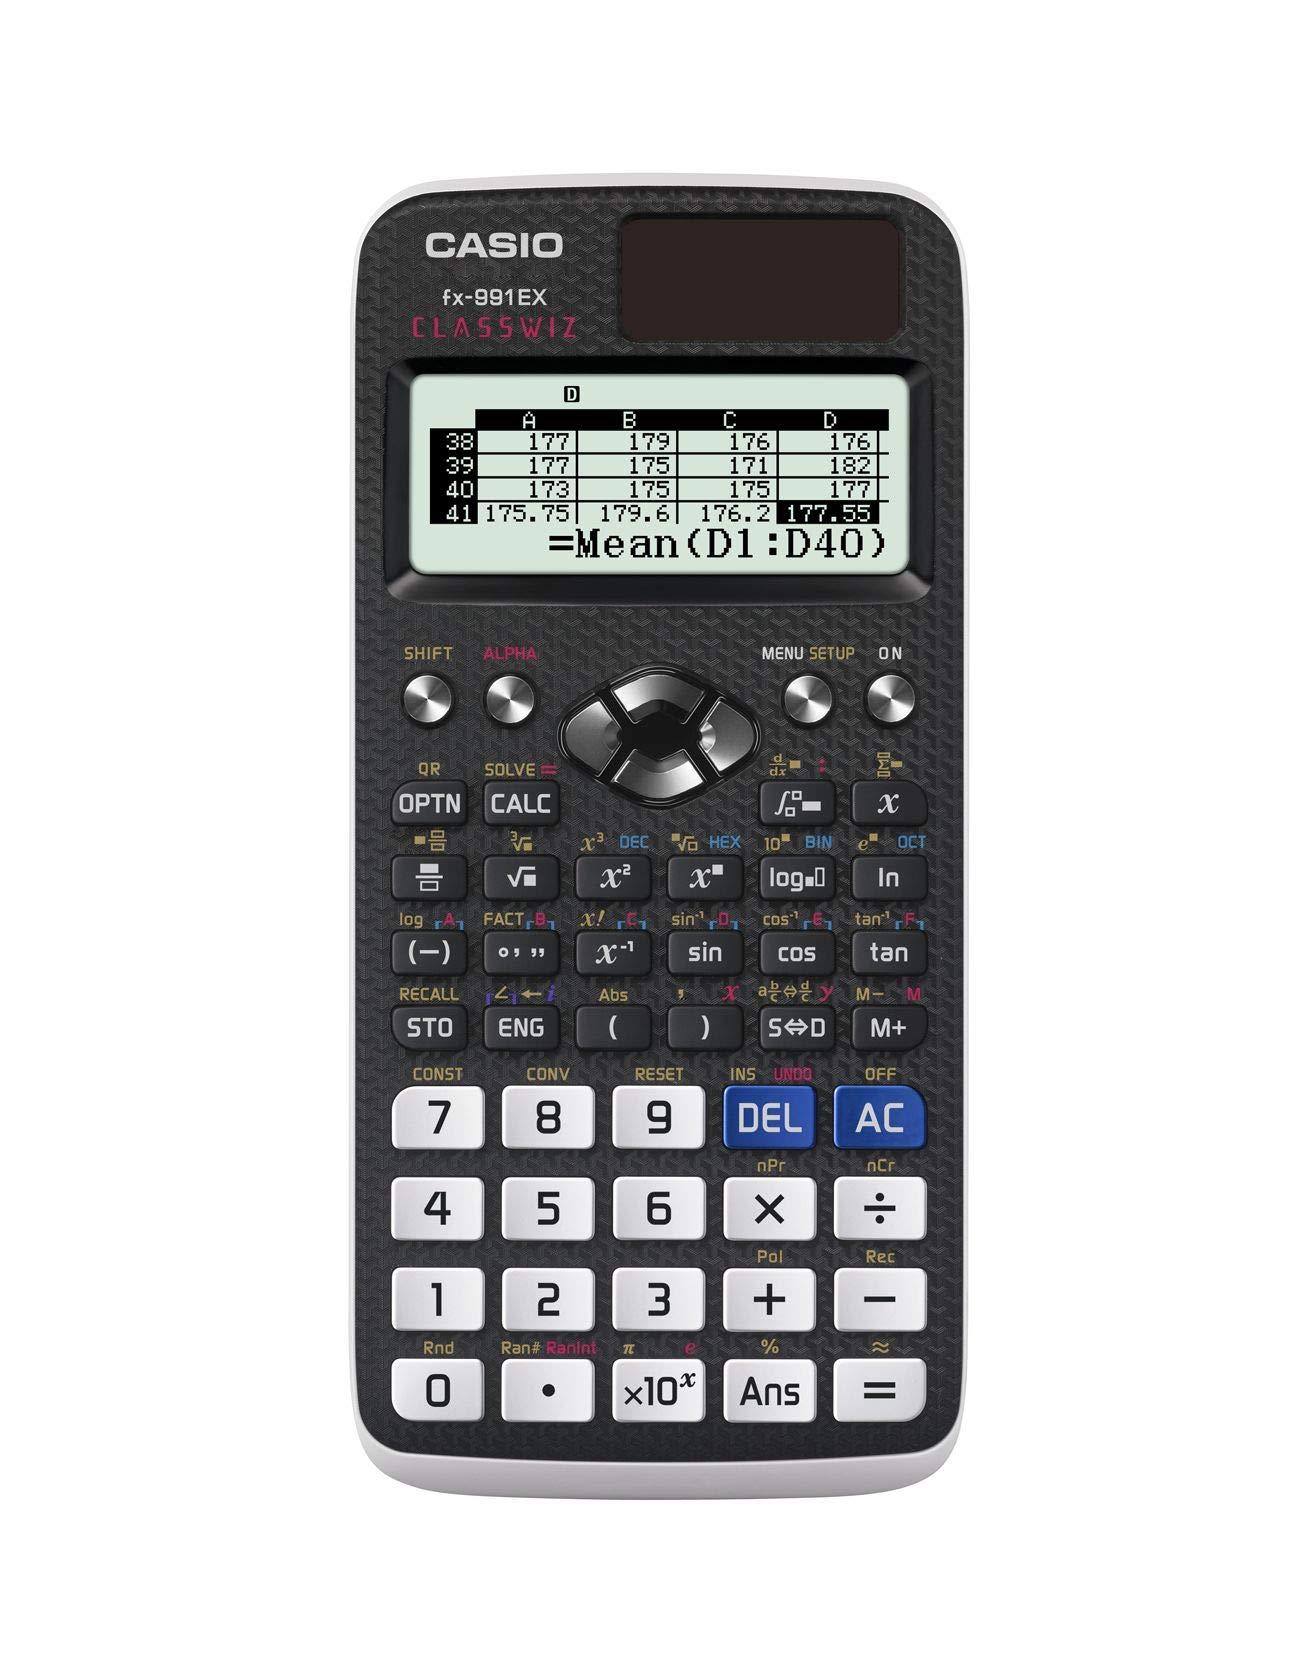 Casio FX-991EX Engineering/Scientific Calculator, Black by Casio